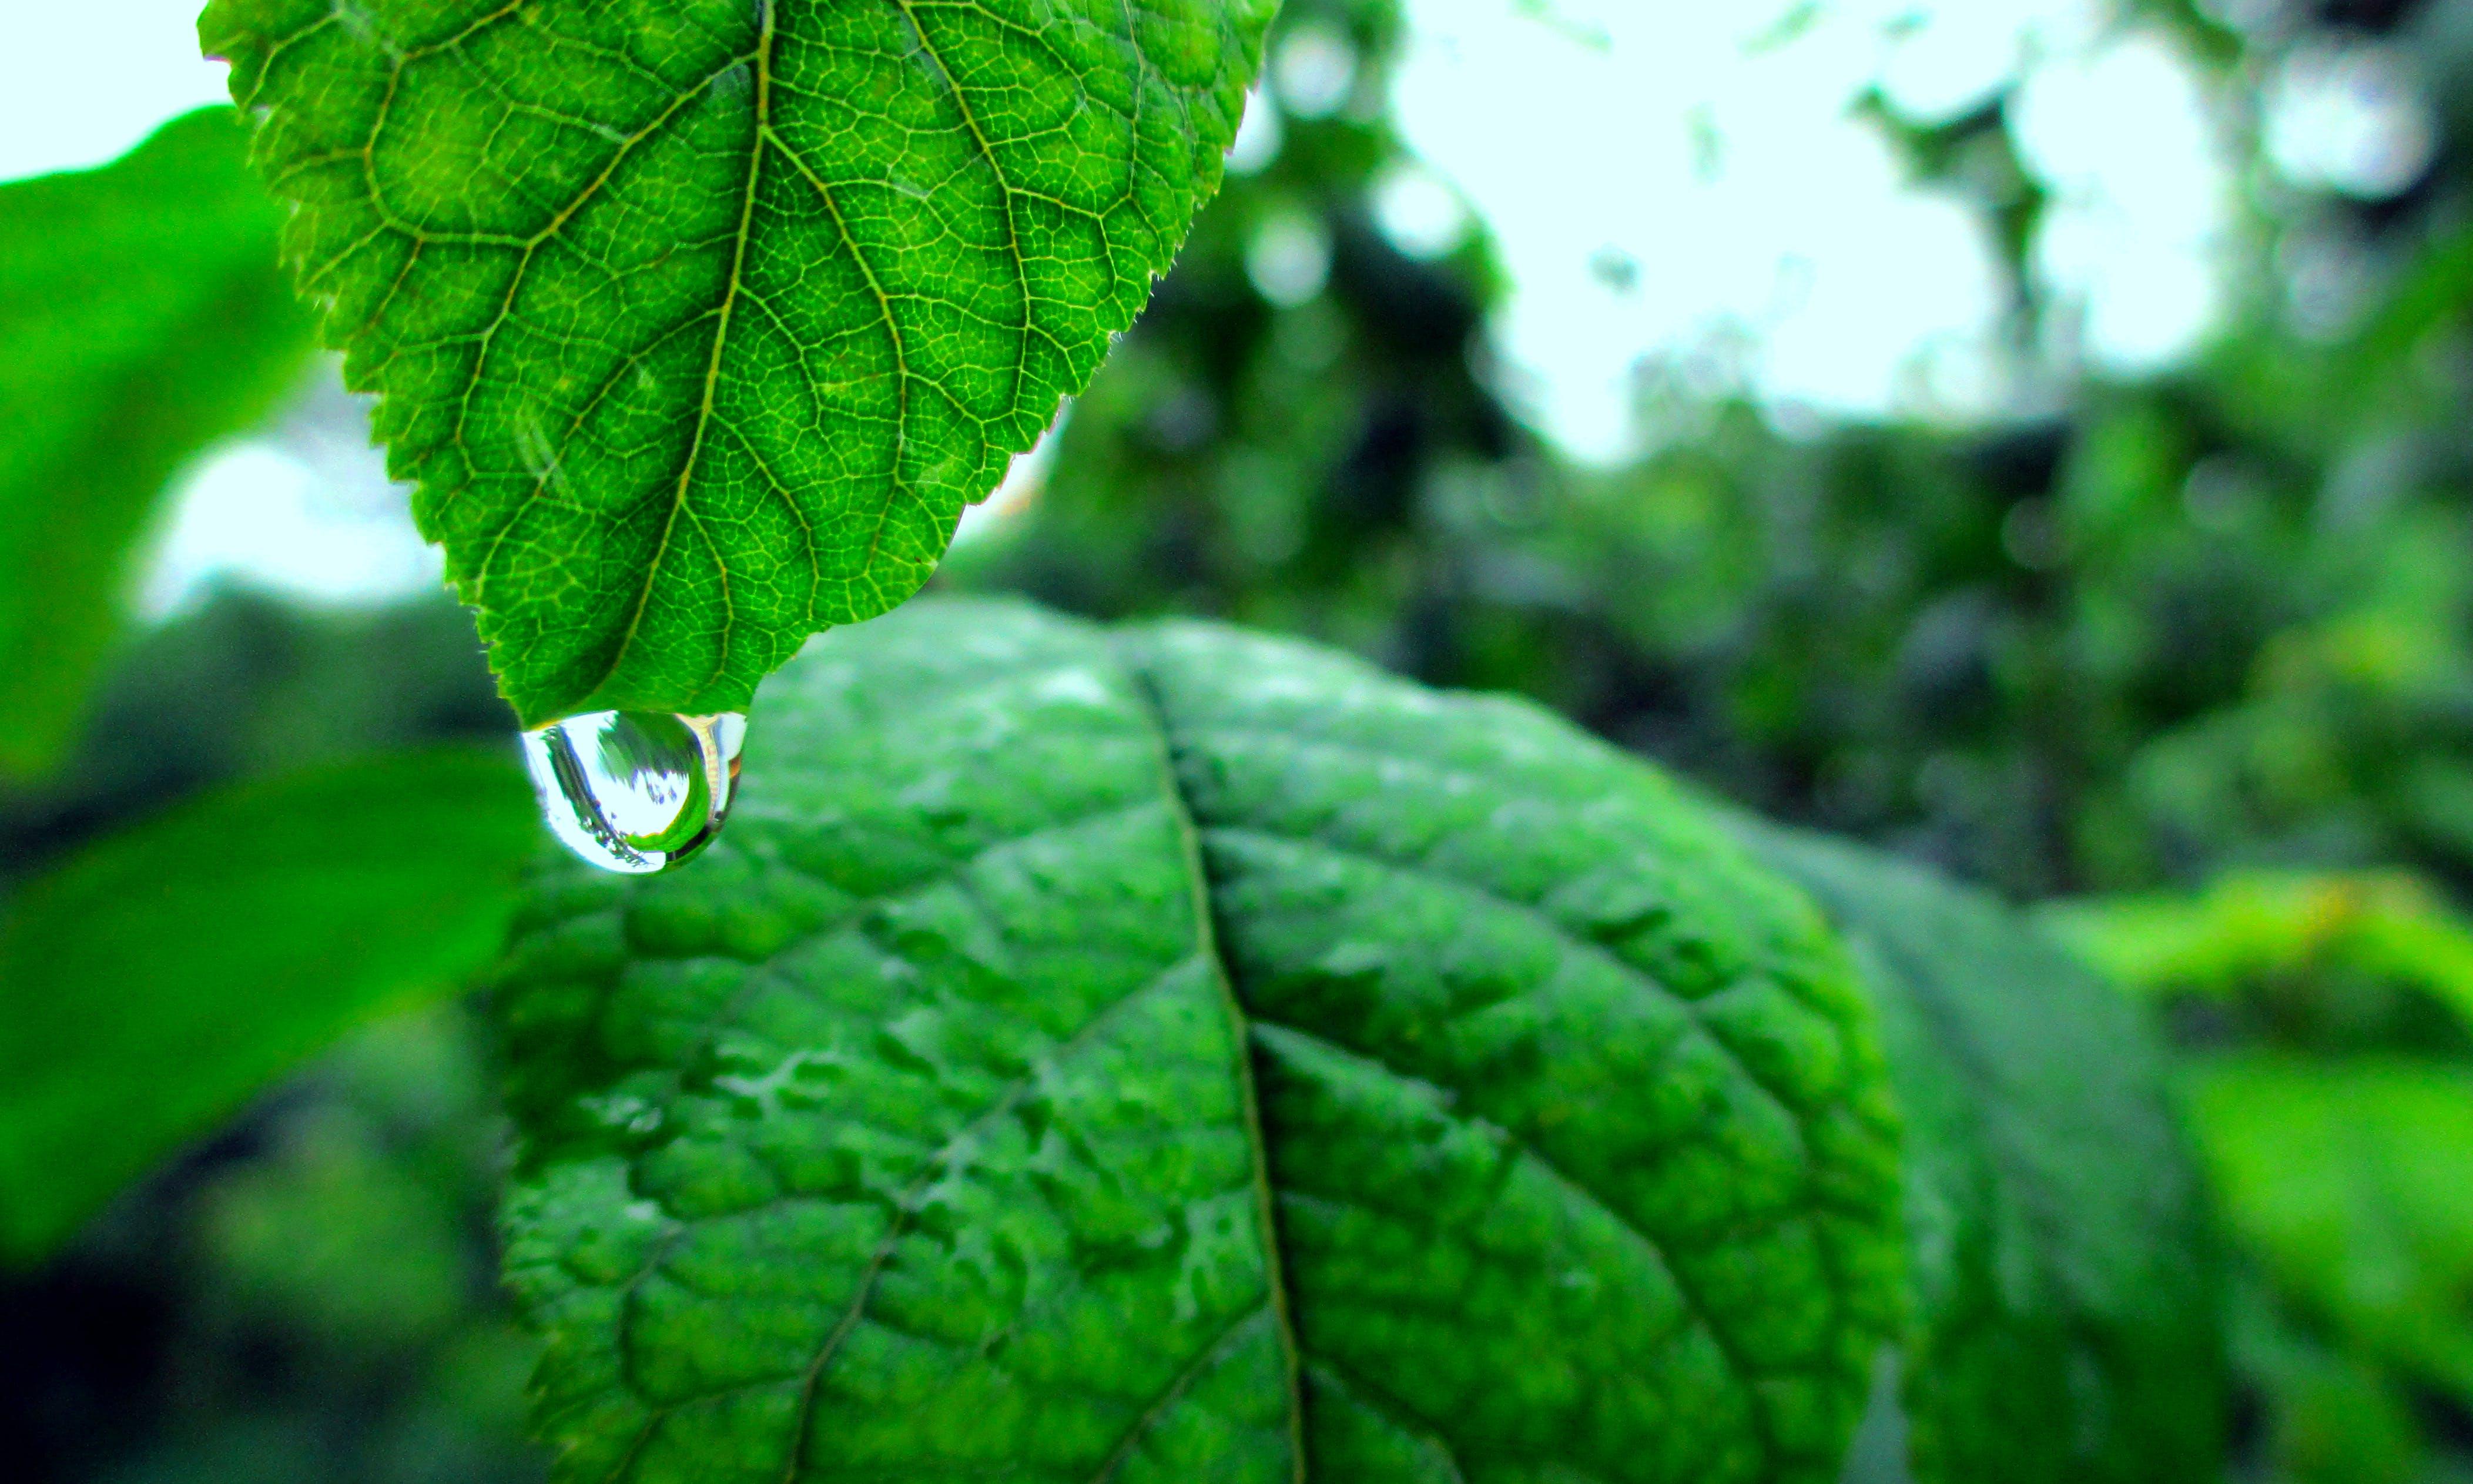 closeup, drop of water, green